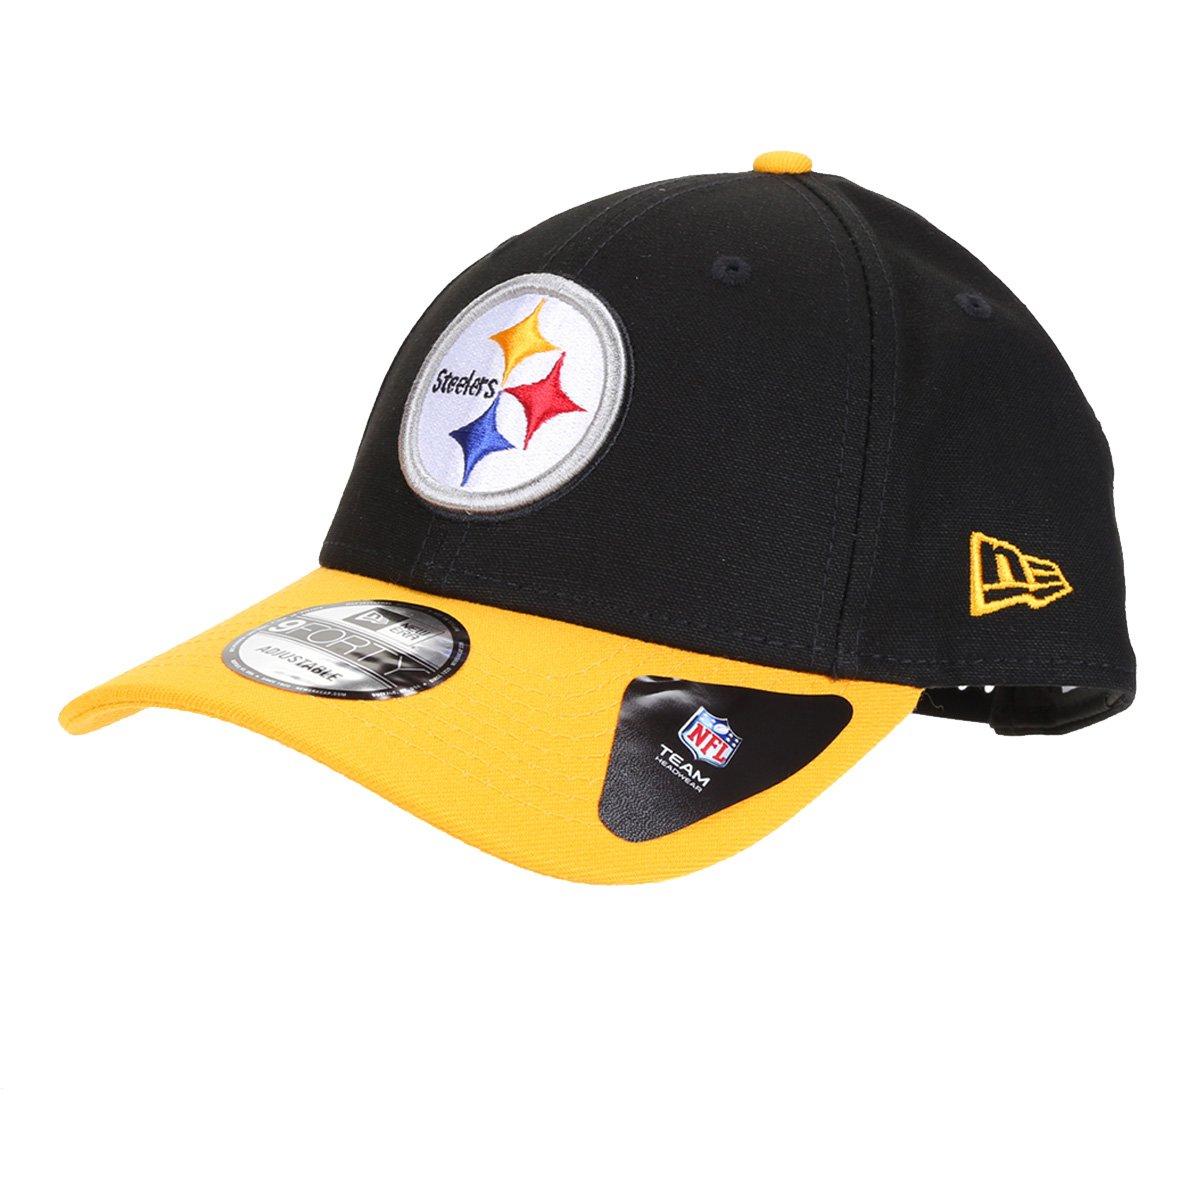 Boné New Era NFL Pittsburgh Steelers Aba Curva Snapback 940 Team Color